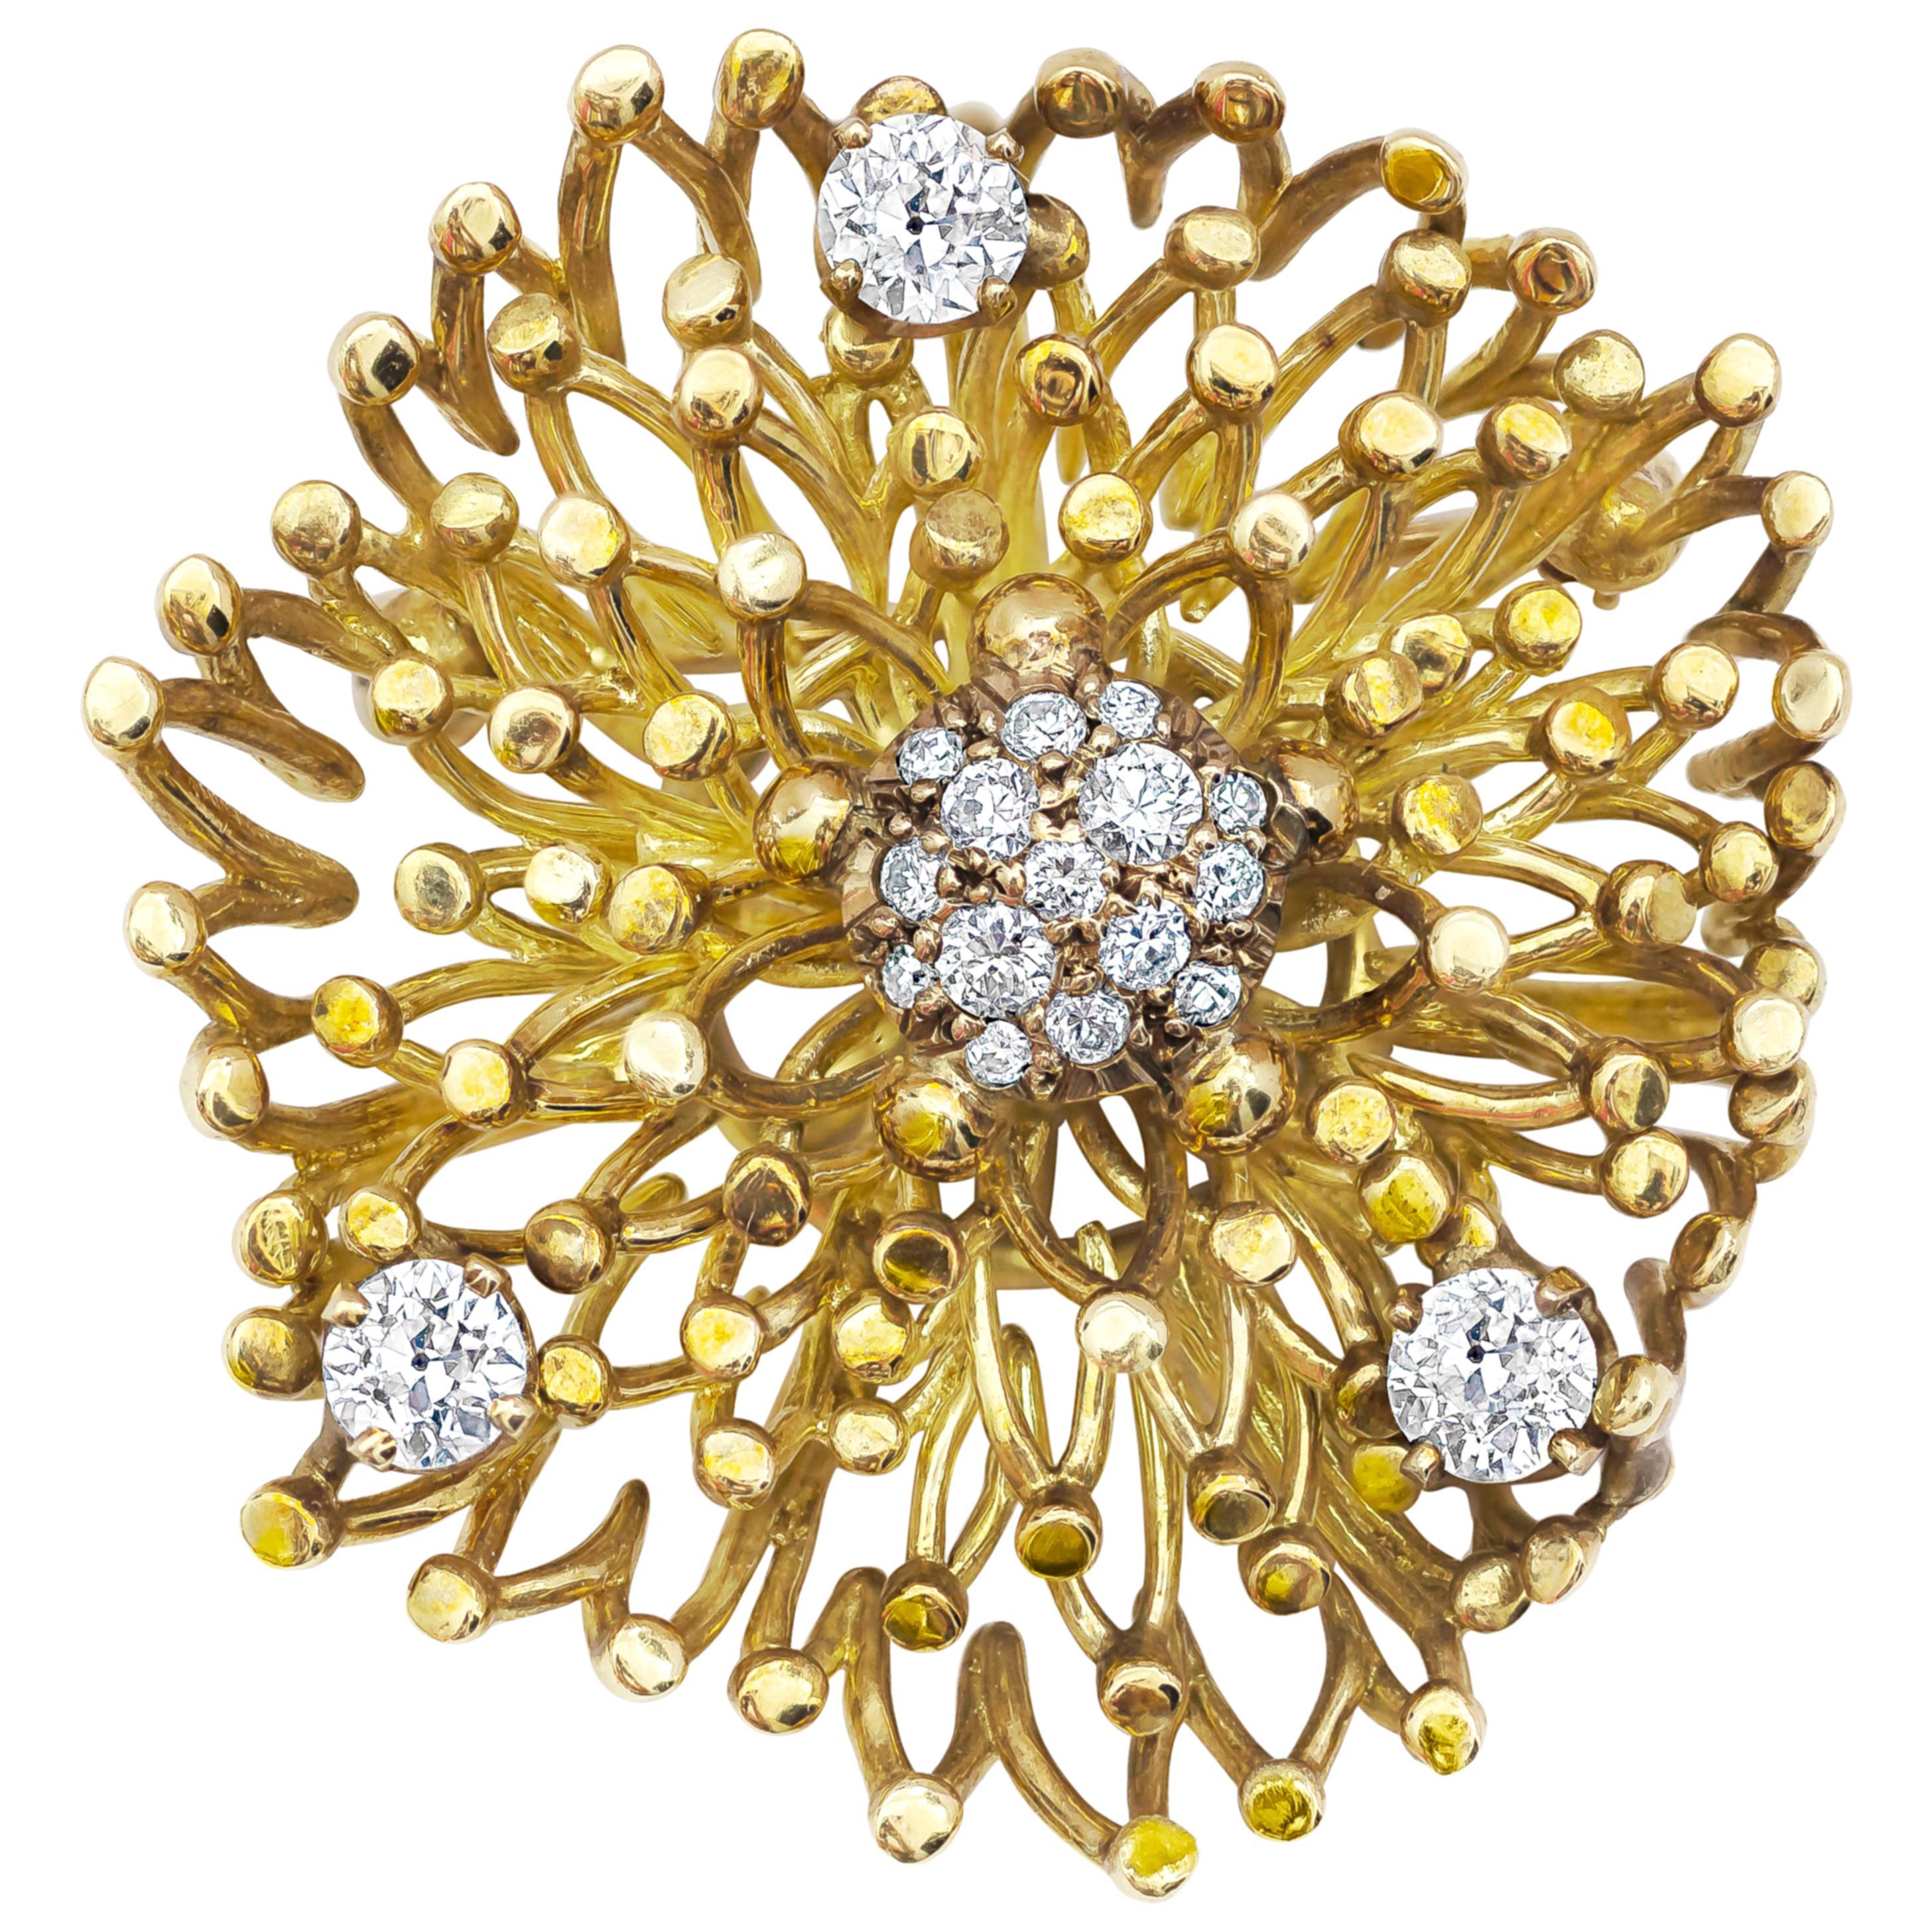 18 Karat Yellow Gold and Diamond Brooch